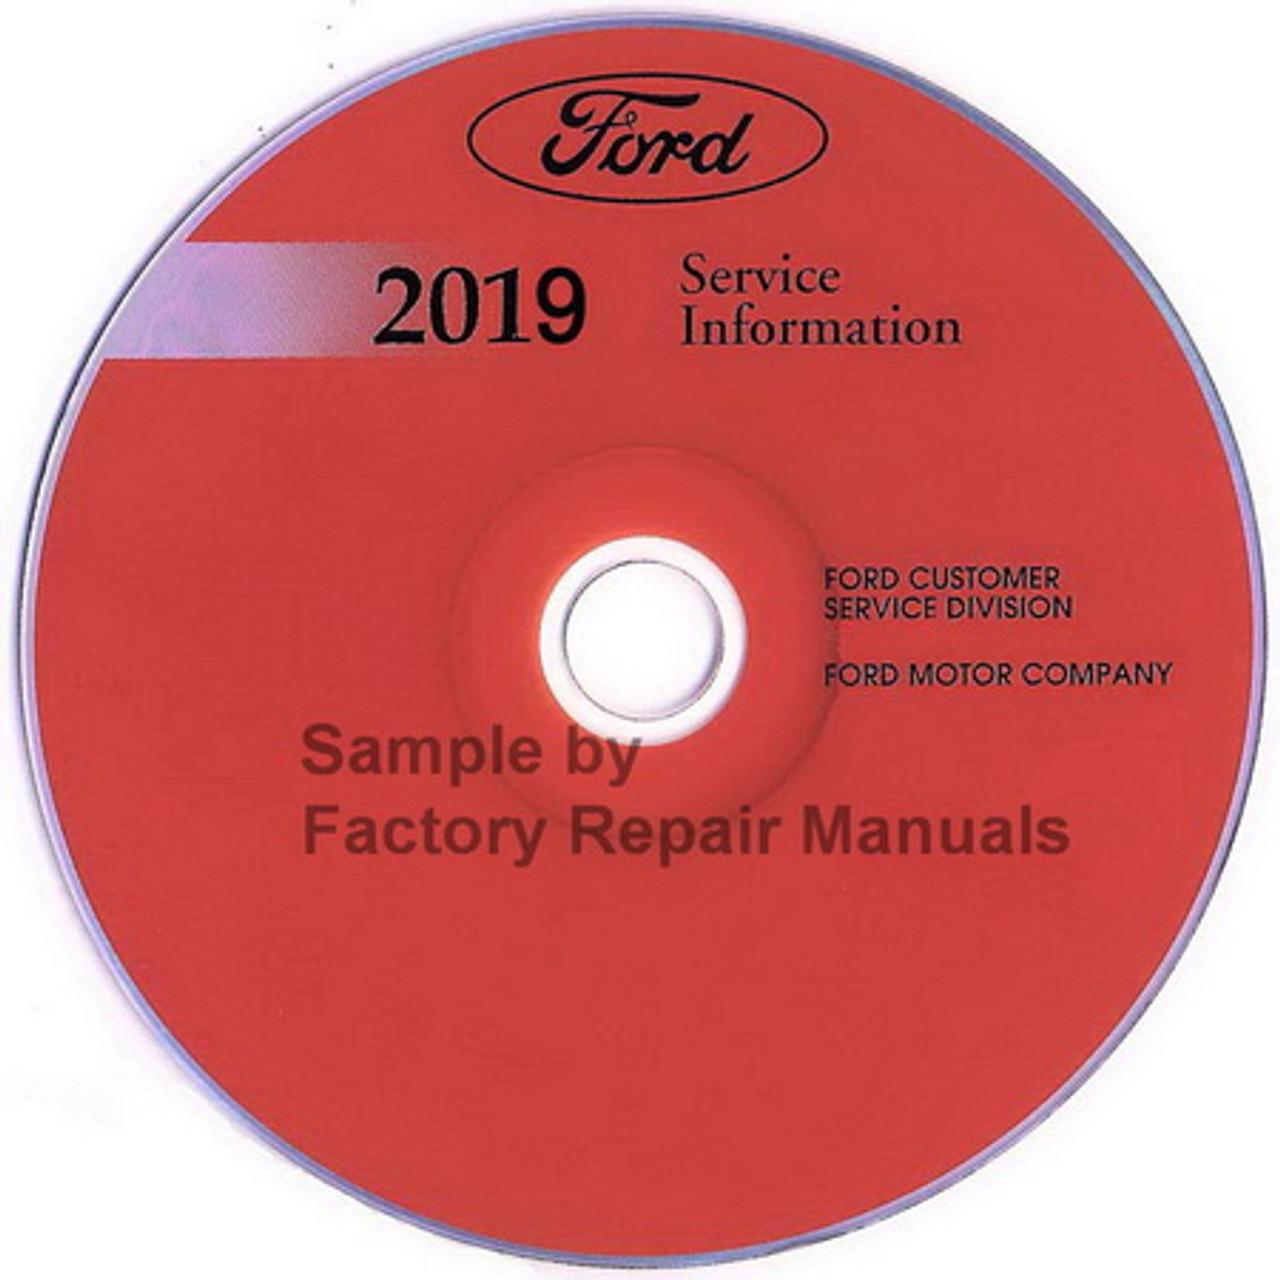 Car & Truck Manuals Service & Repair Manuals 2001 Lincoln Town Car ...